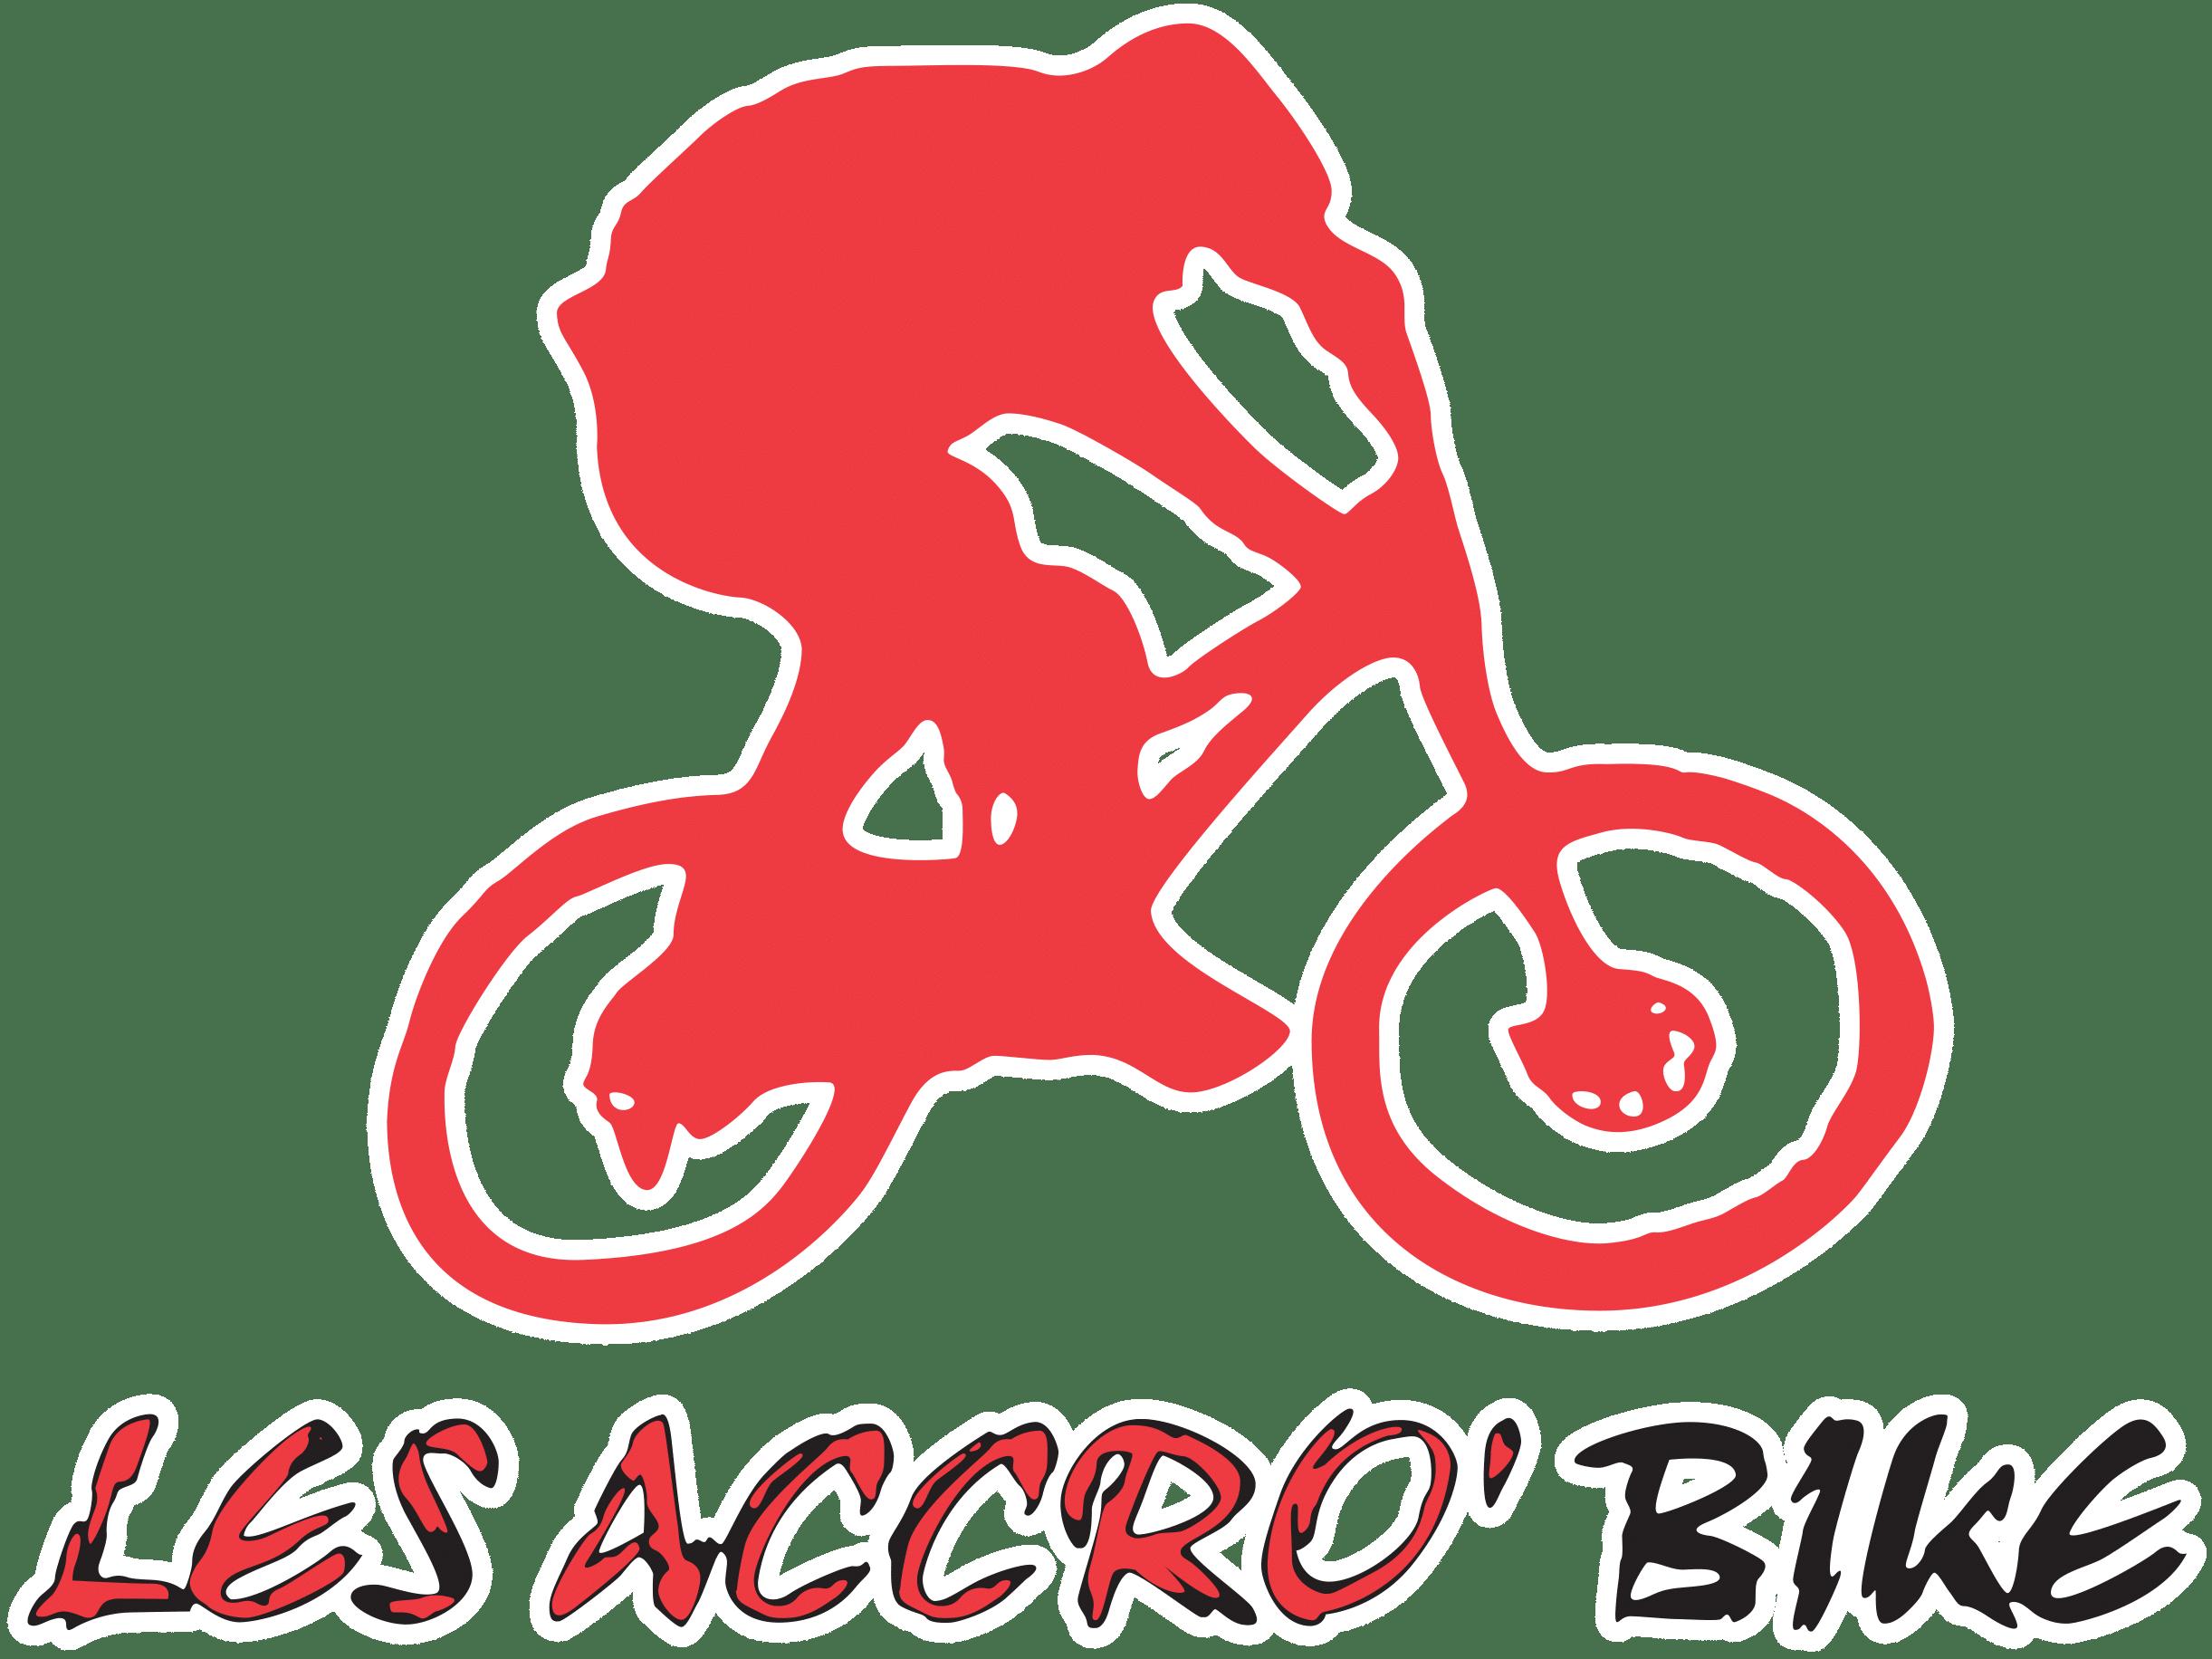 Les Accro Bike - Calvados